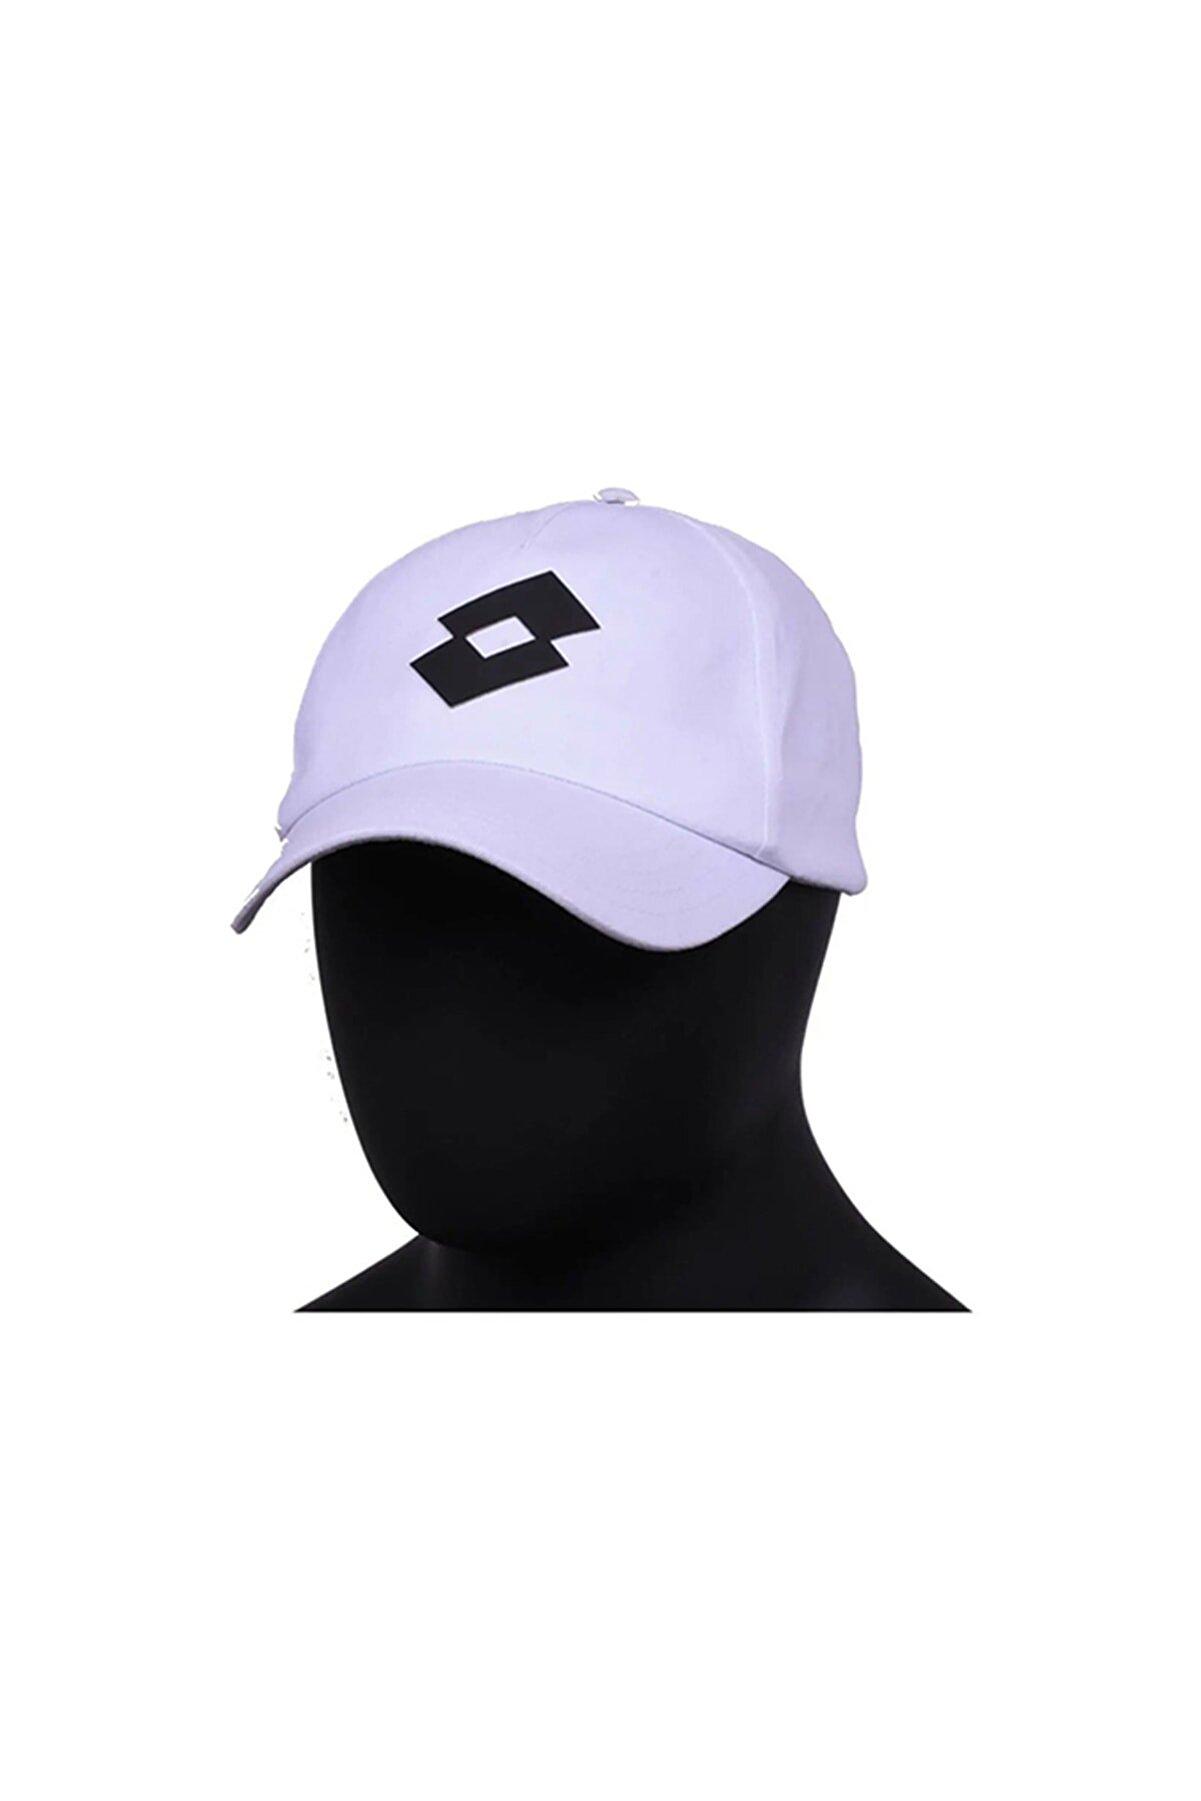 Lotto Şapka Beyaz Unisex  R8781